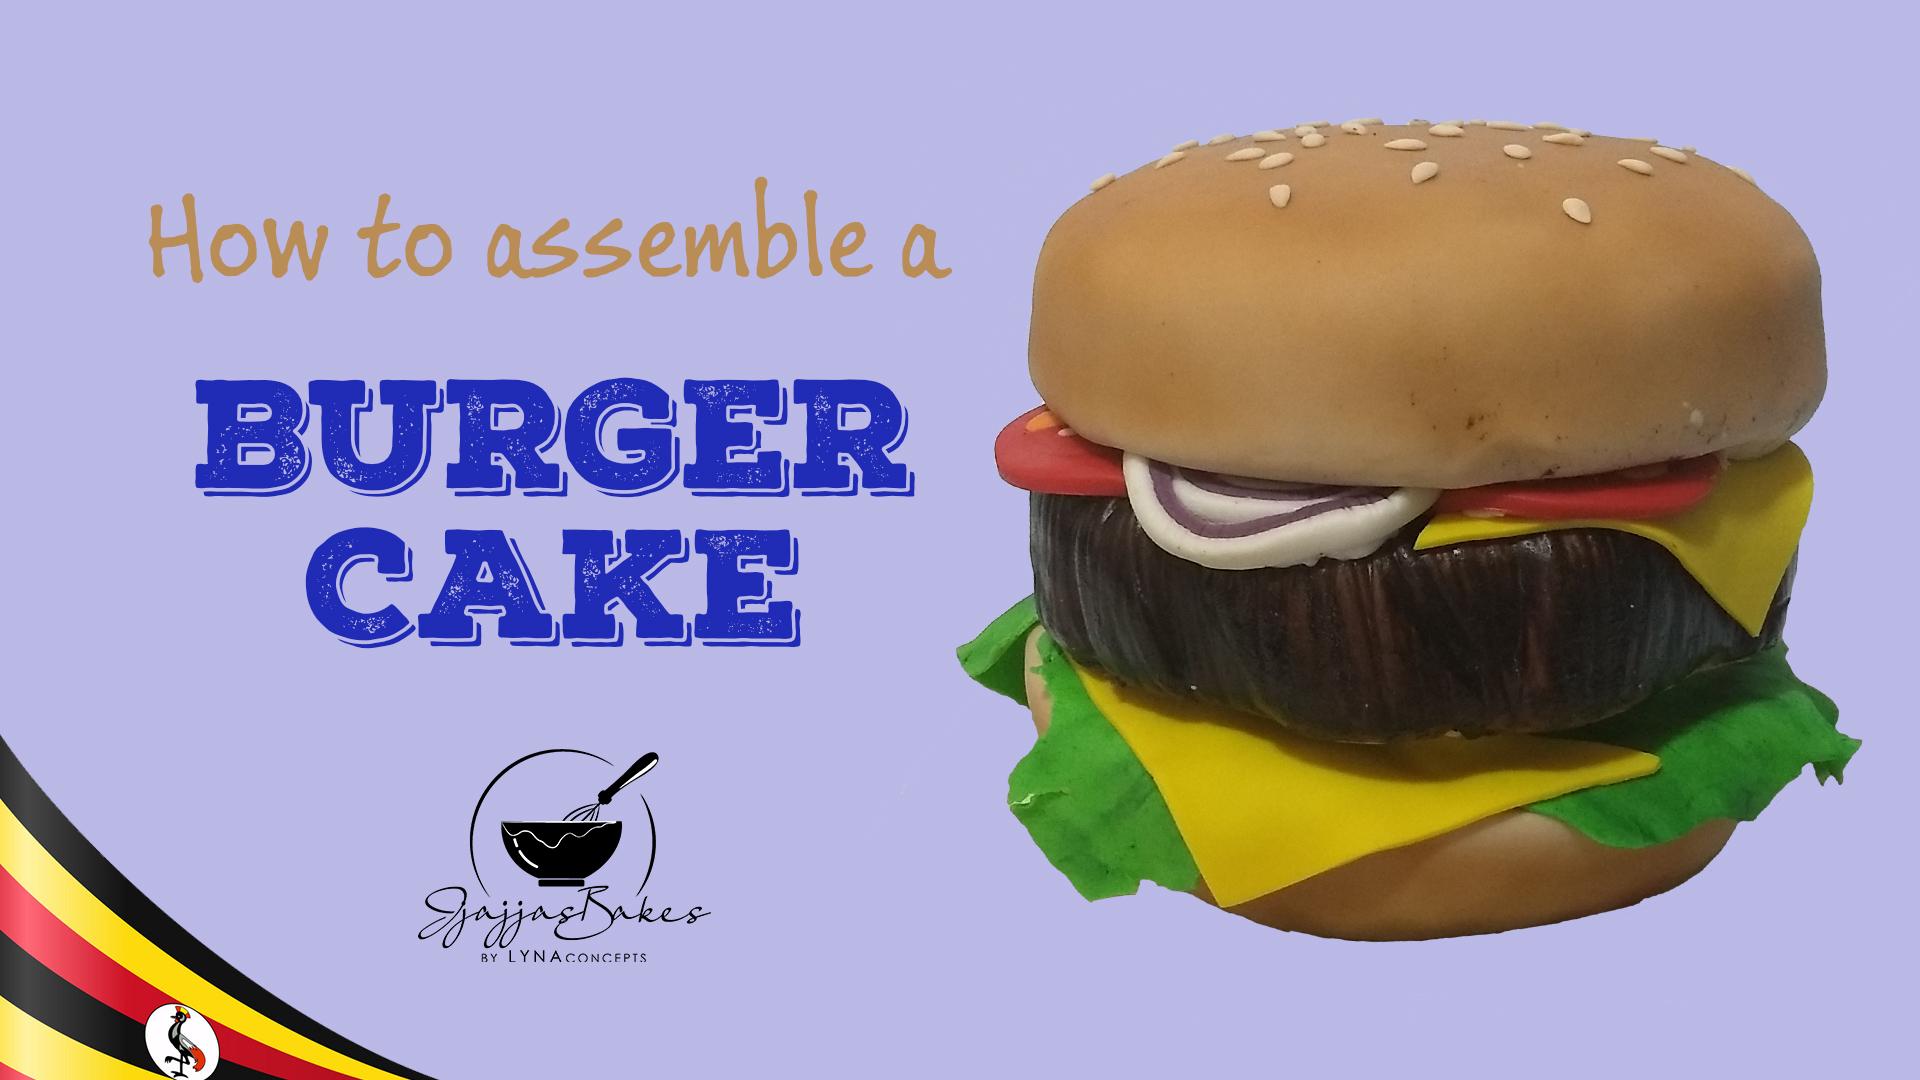 JjajjasBakes_By_LYNAconcepts_Tutorial_Assembling_A_Burger_Cake_YouTube